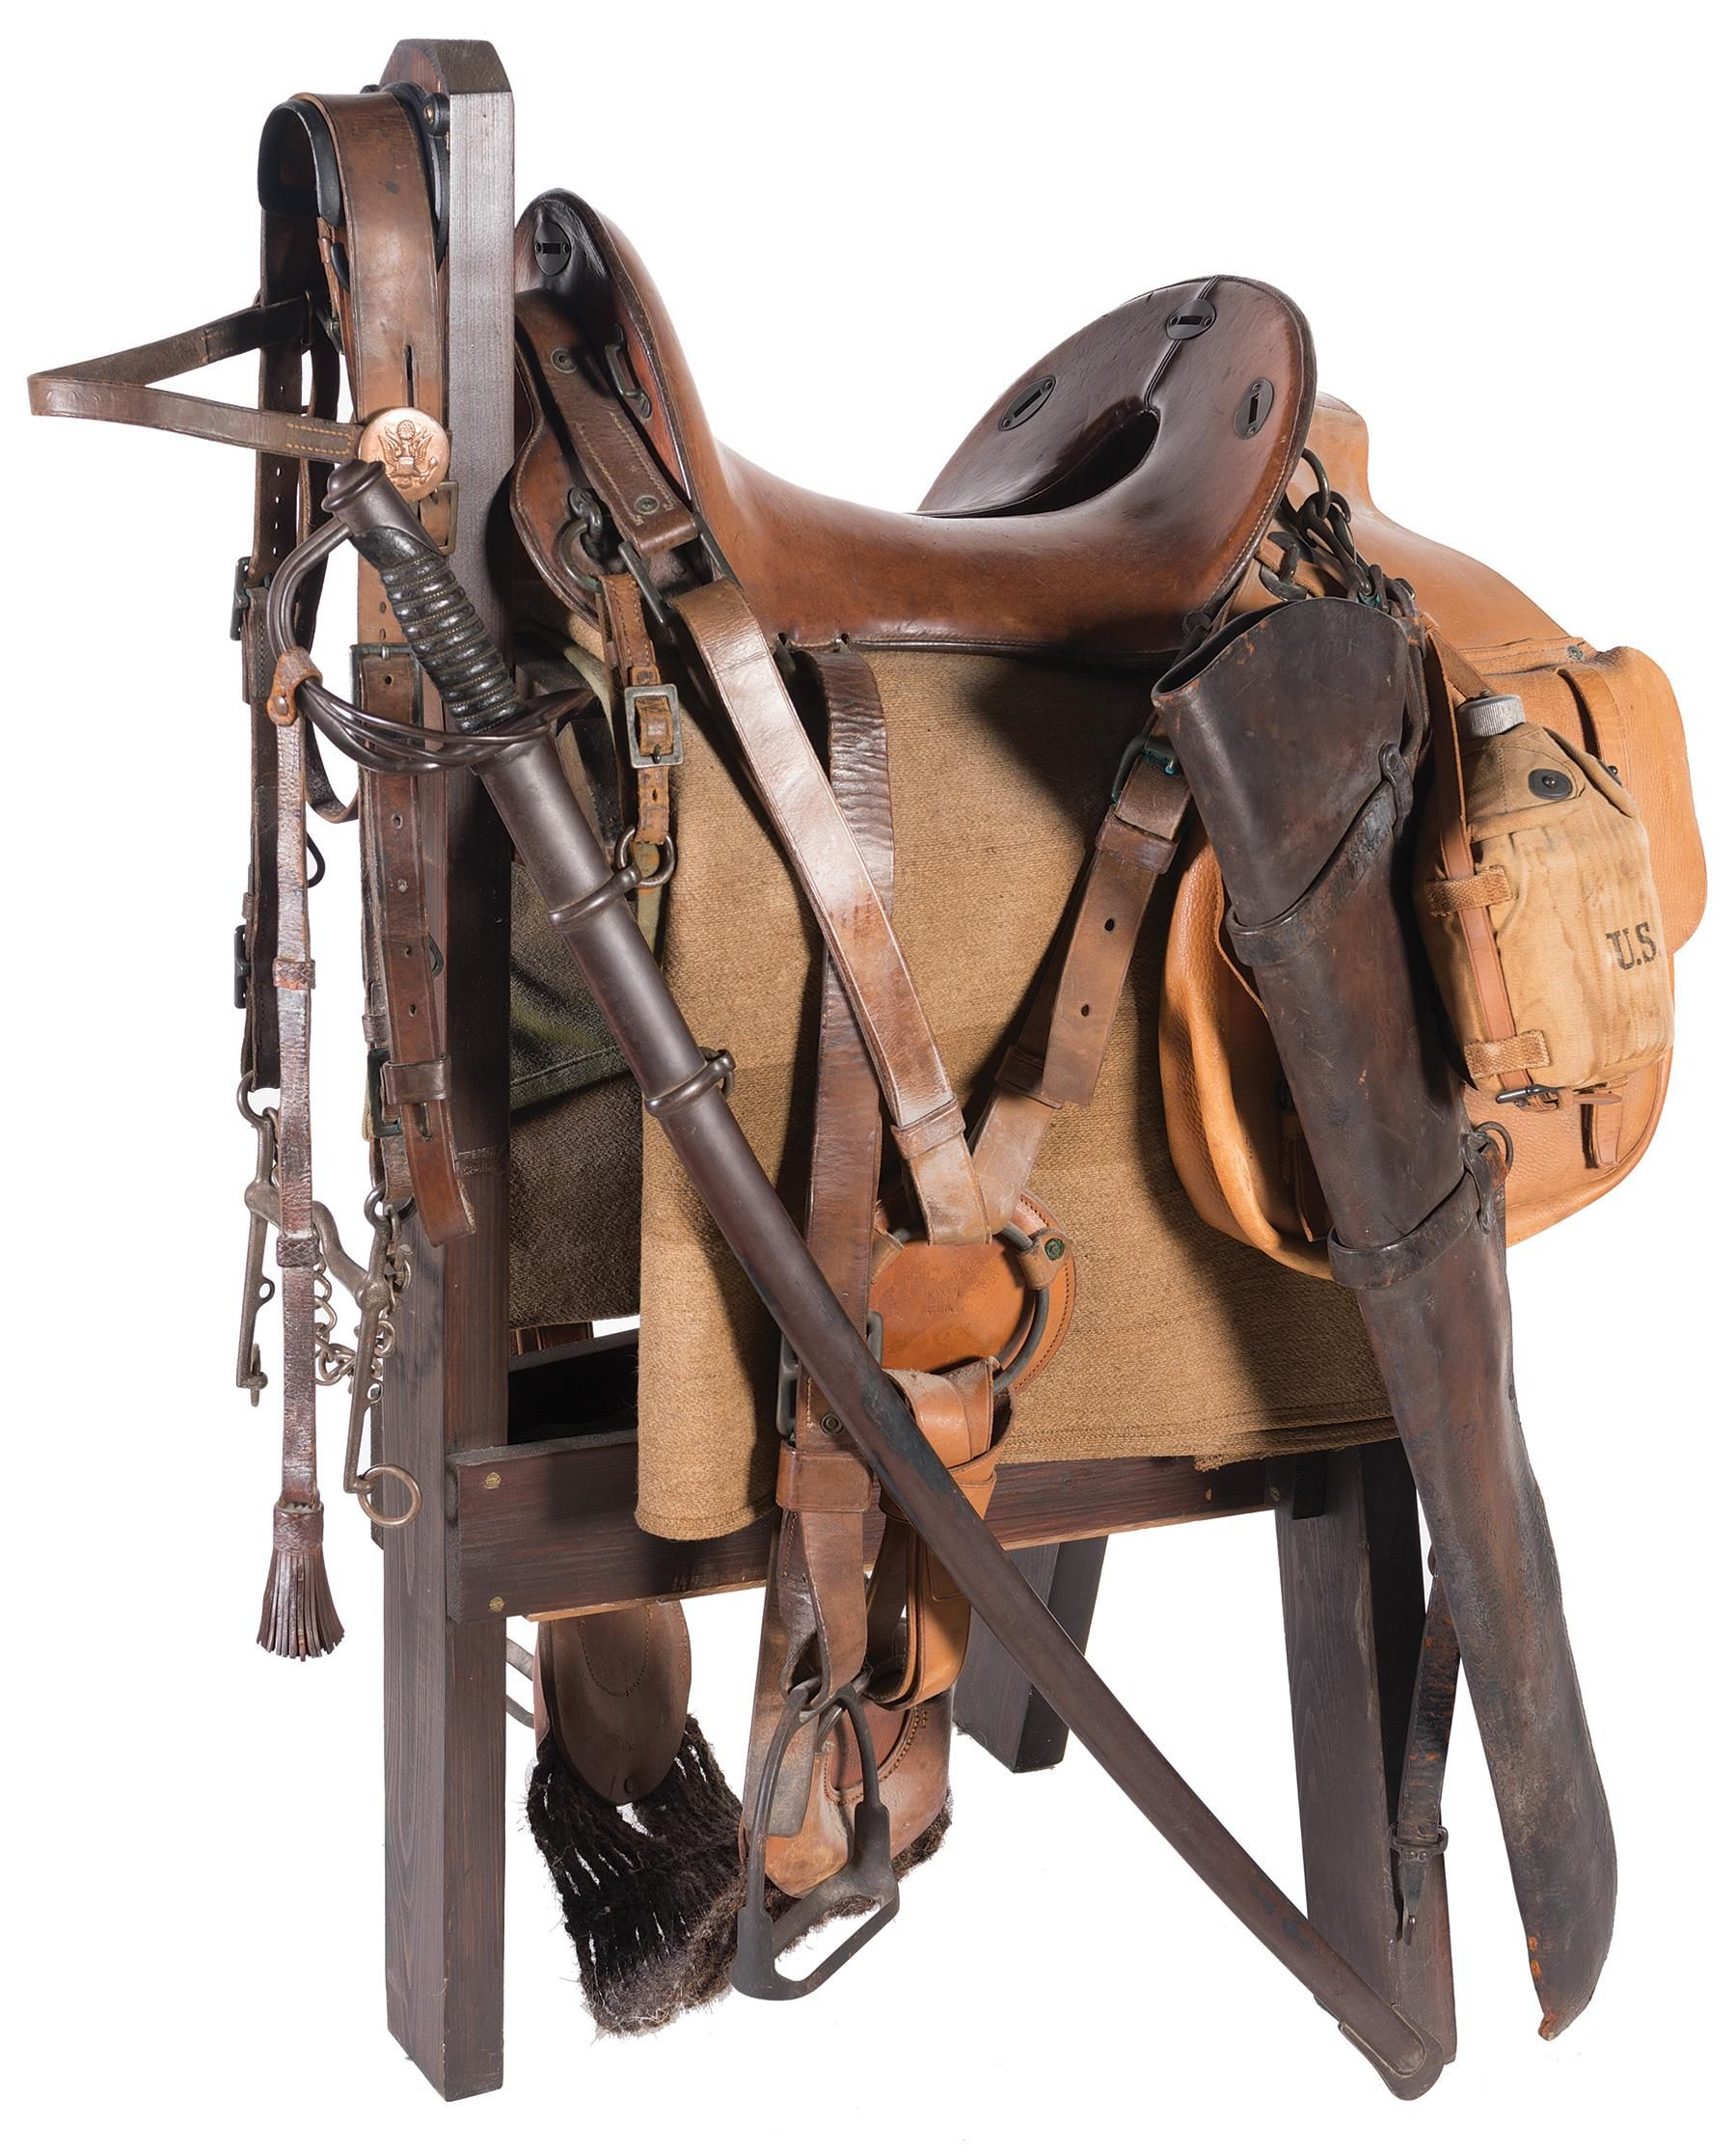 WWI Era Model 1904 McClellan Saddle with Accessories   Guns